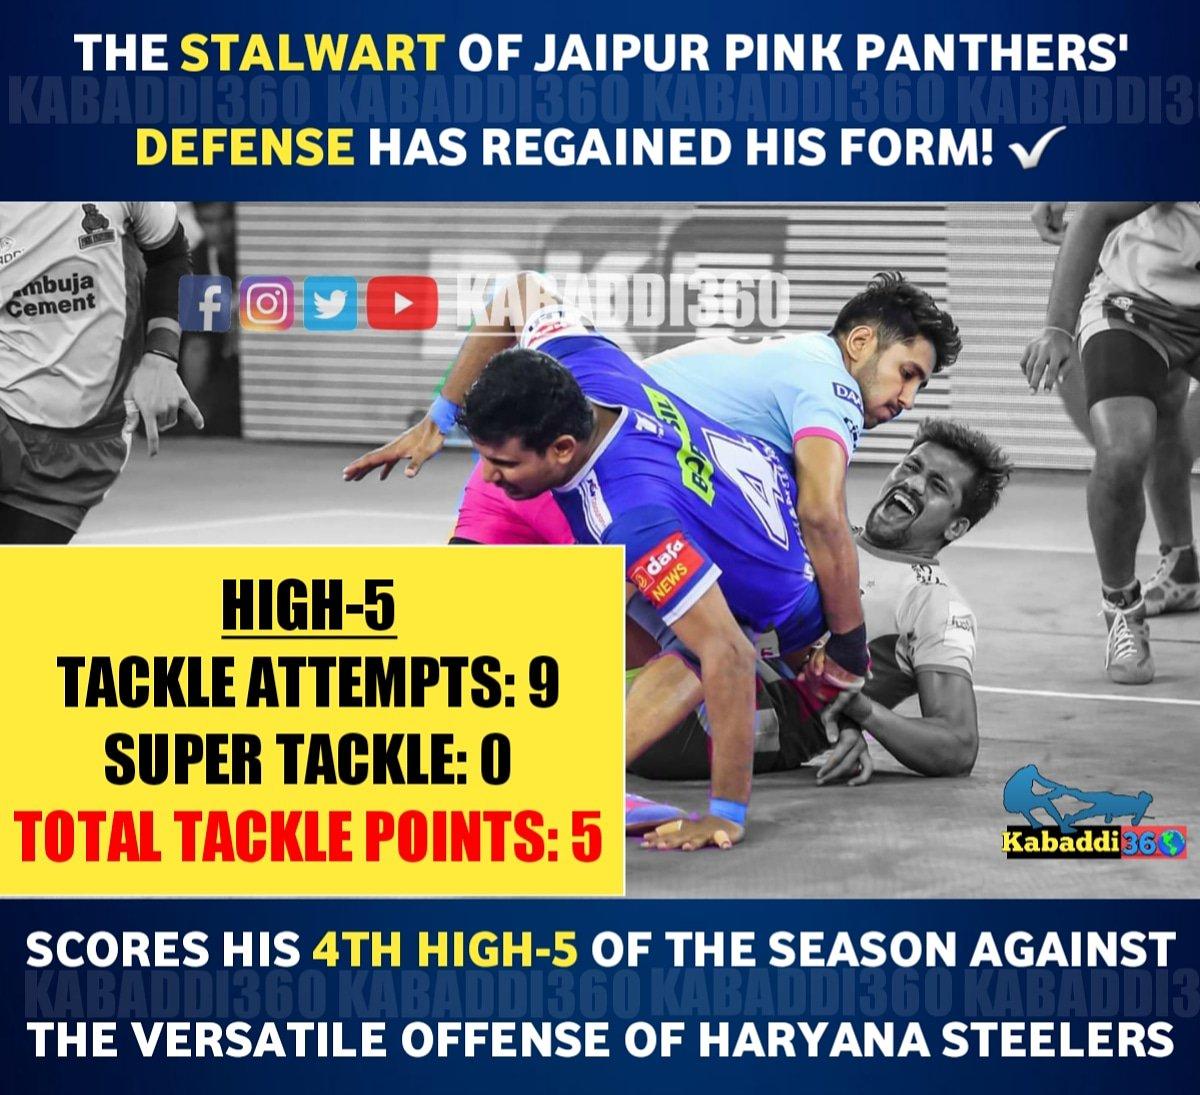 Sandeep Dhull has moved to 49 raid points in 14 matches thus far!   #SandeepDhull  #JaipurPinkPanthers  #HARvJAI #IsseToughKuchNahi  #pklwithkabaddi360